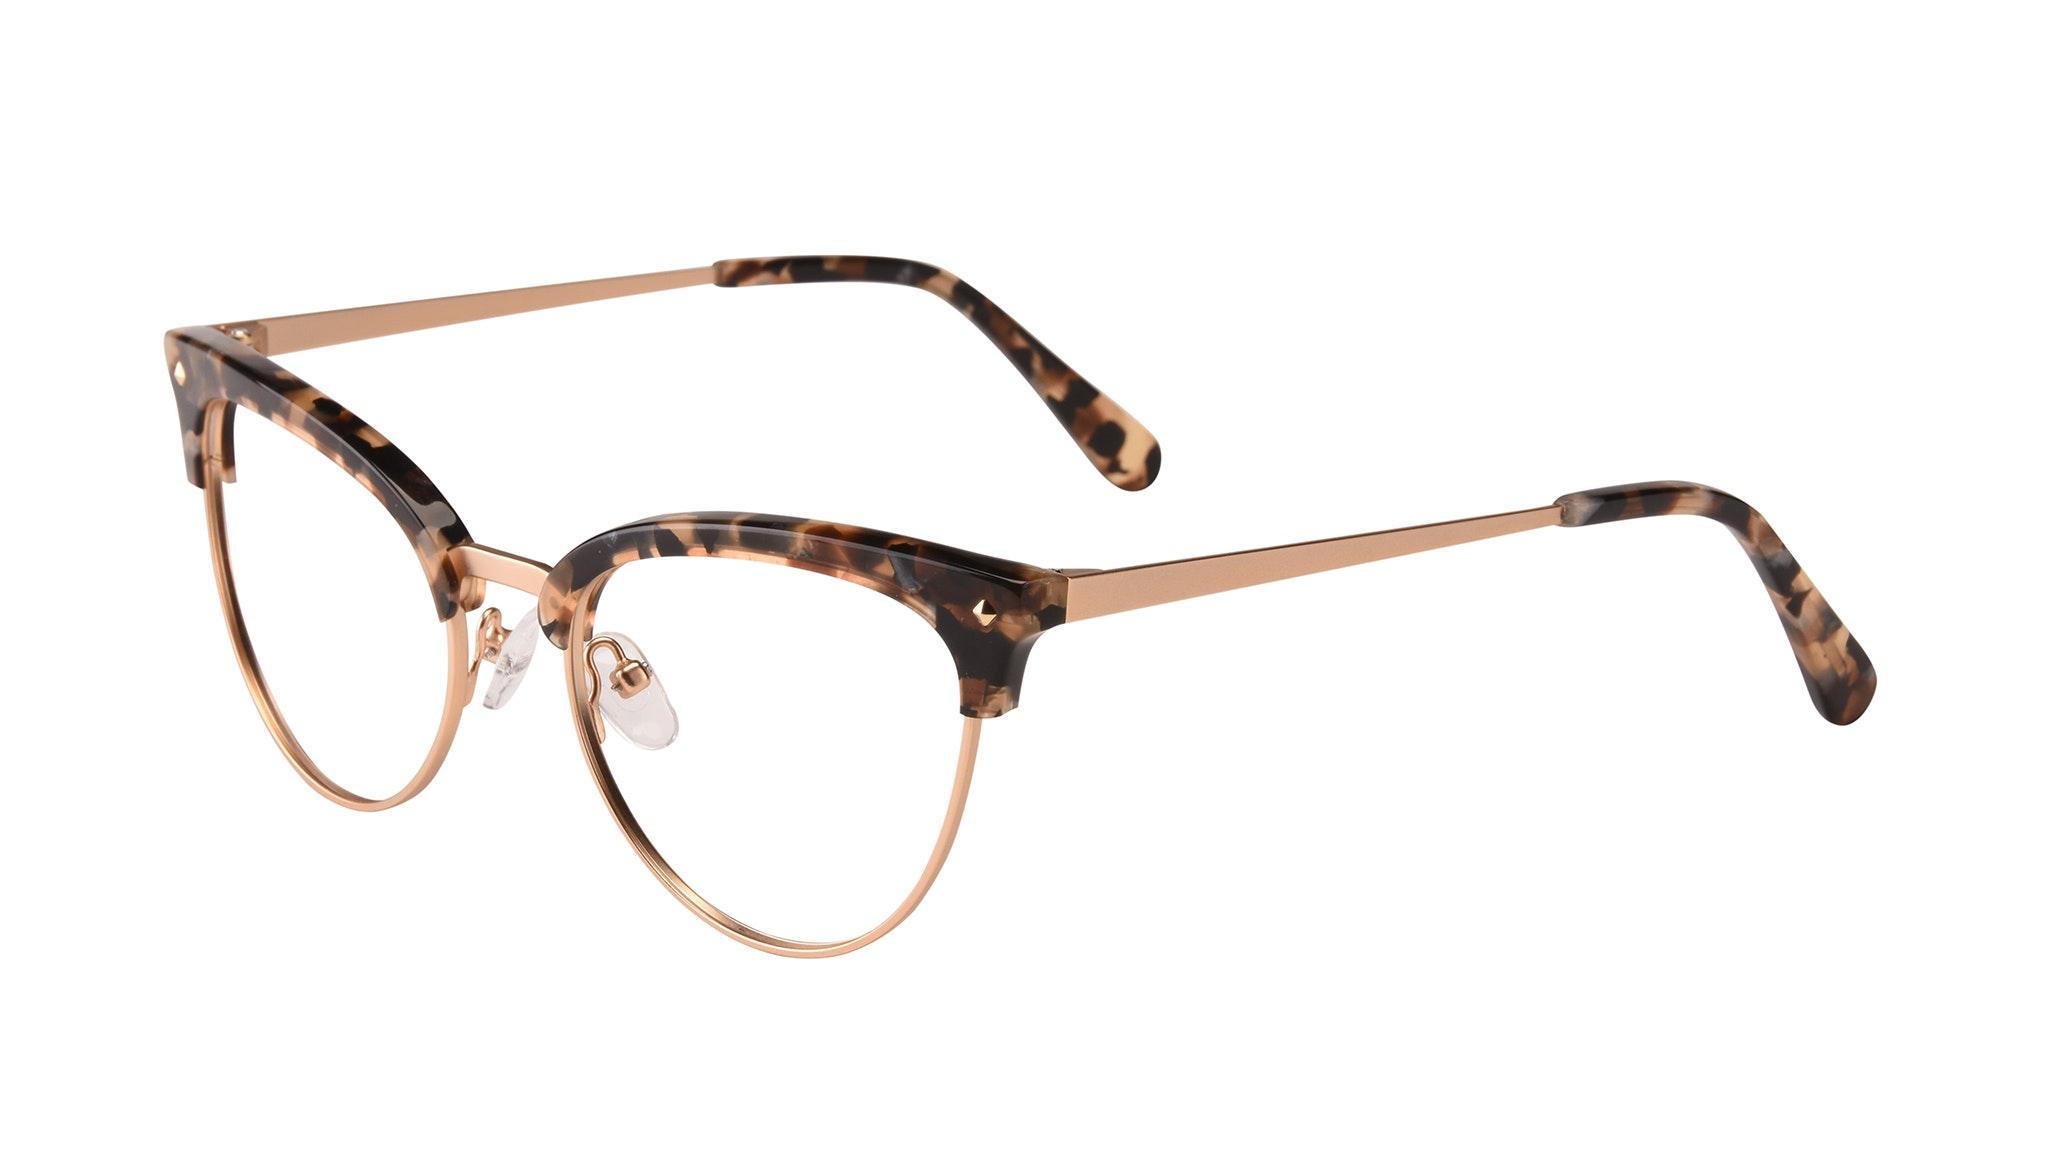 Affordable Fashion Glasses Cat Eye Daring Cateye Eyeglasses Women Moon Gold Flake Tilt